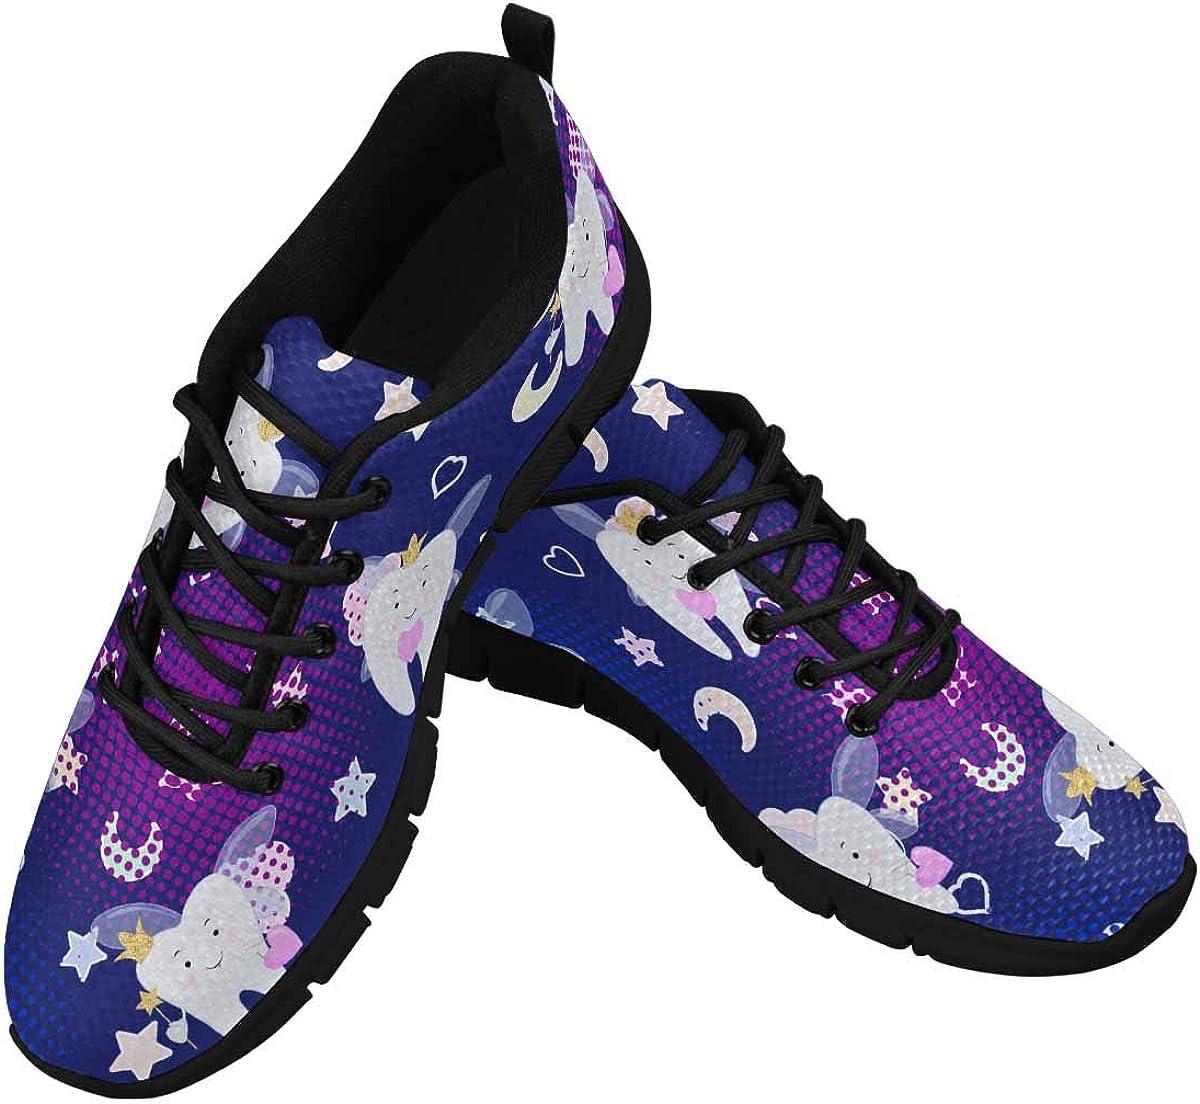 InterestPrint Tooth Fairy Cartoon Women's Athletic Walking Running Sneakers Comfortable Lightweight Shoes